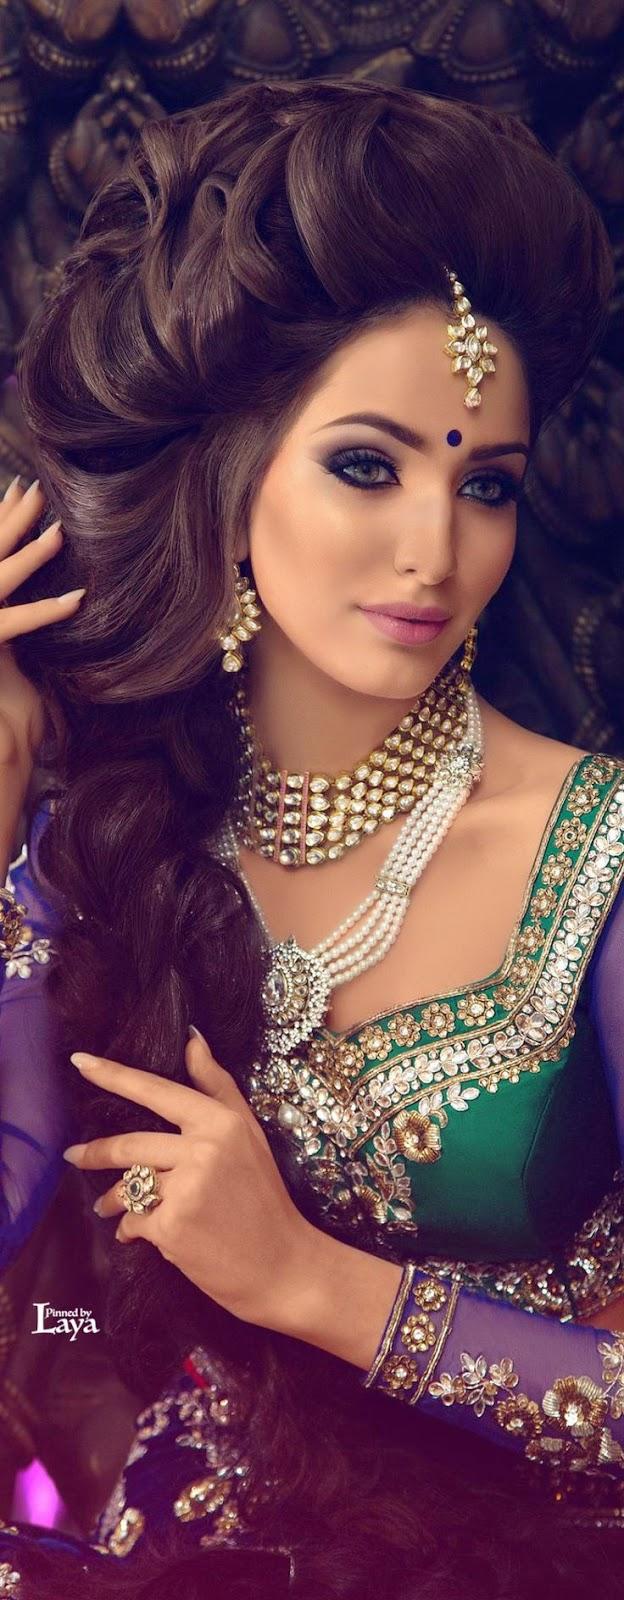 new indian bridal makeup photos 2015 - hair style